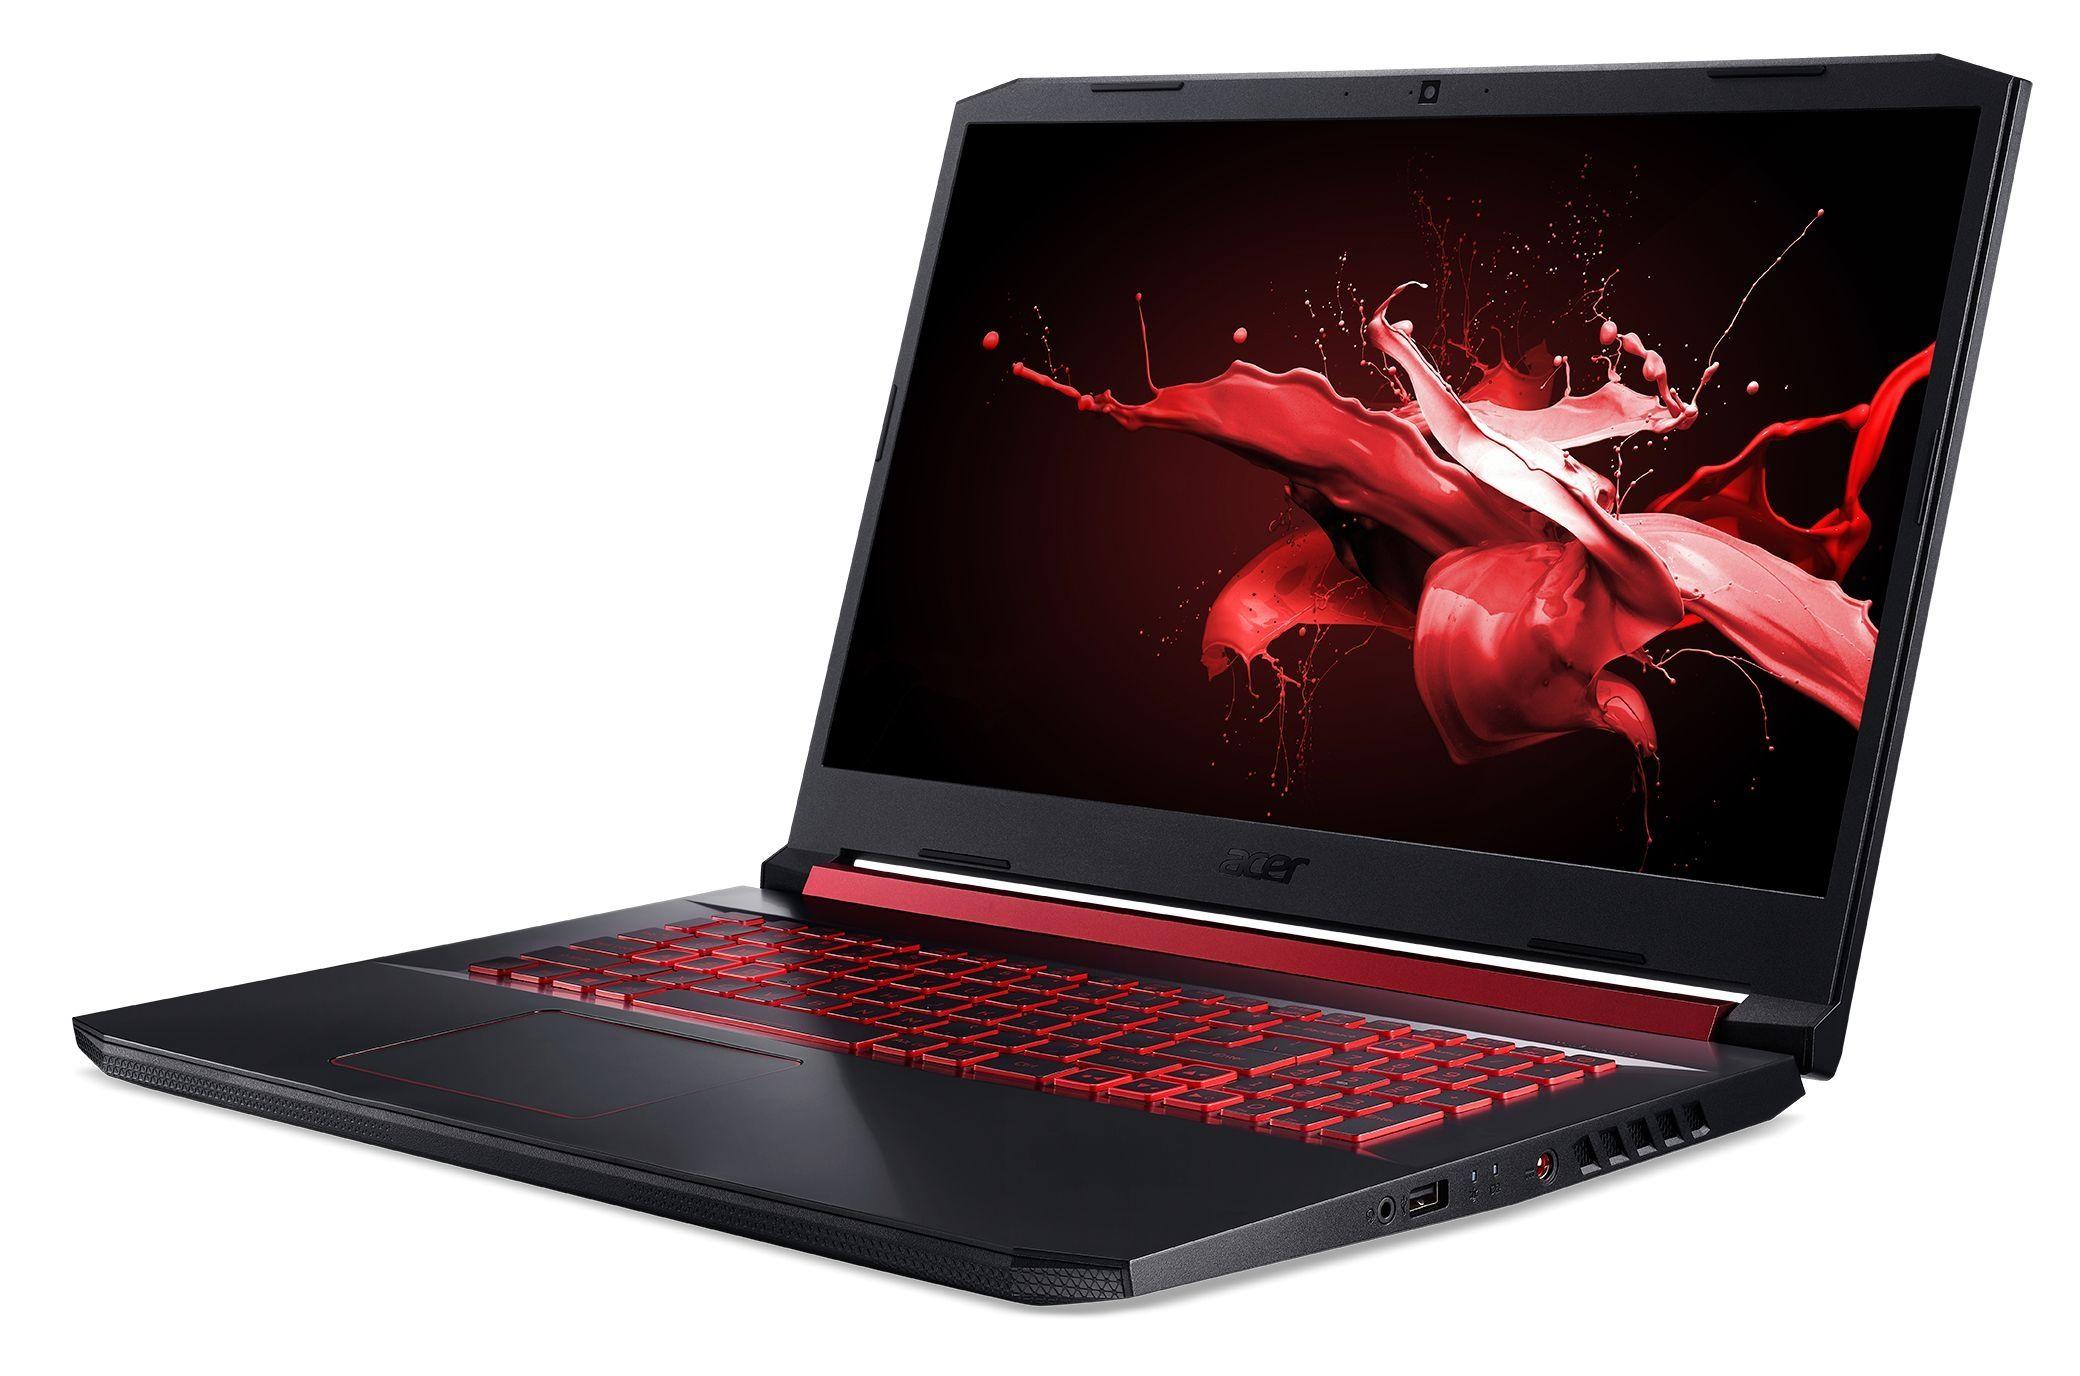 "Геймърски лаптоп Acer Nitro 5 - AN517-51-7553, 17.3"", FHD, черен - 3"